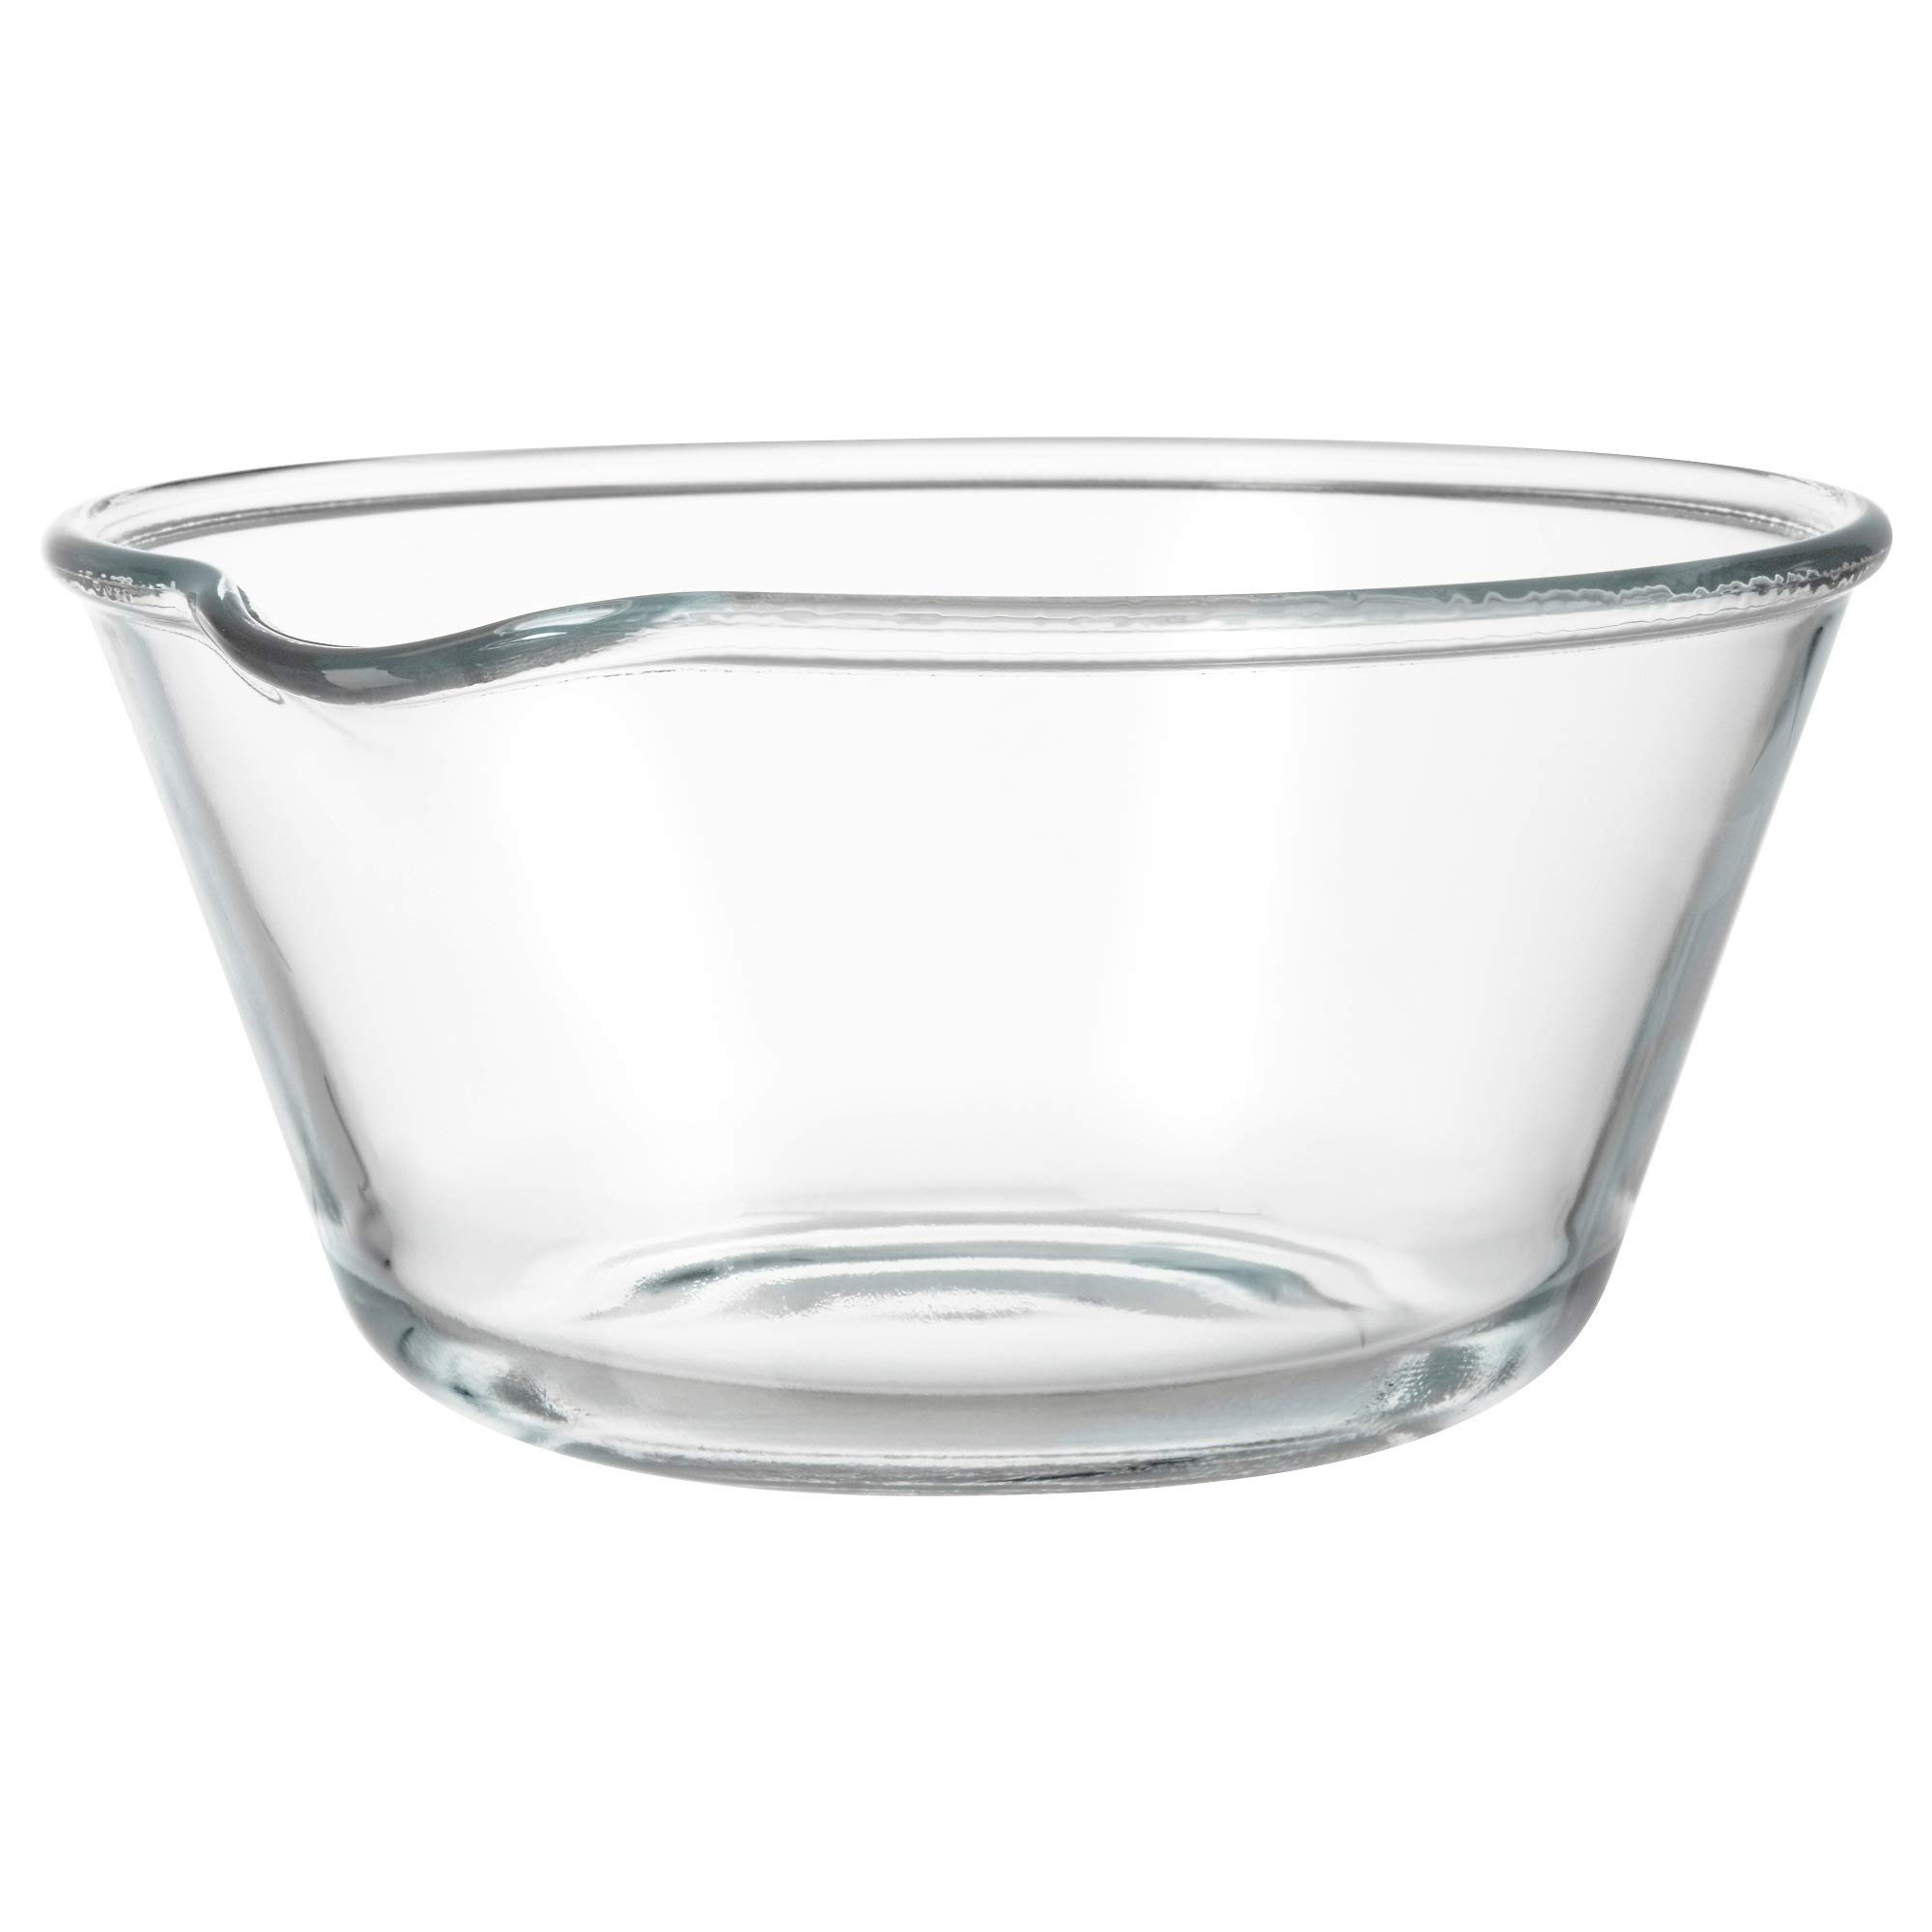 IKEA 702.892.48 Vardagen Bowl, Clear Glass